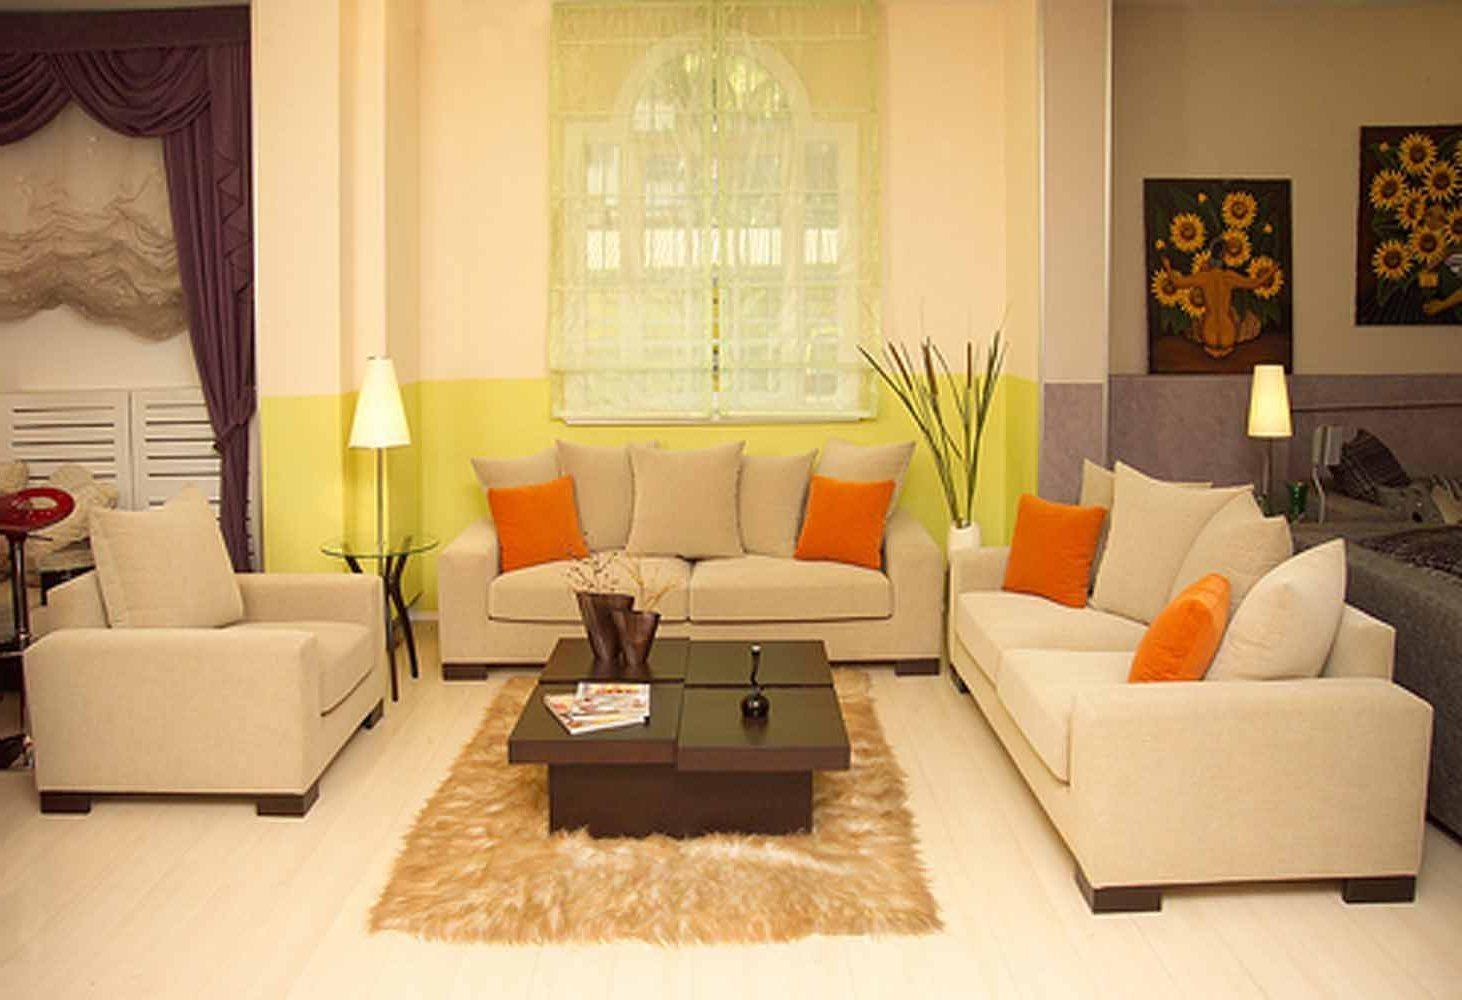 Living Room : Small Living Room Furniture Ideas Cream Color Sofa Inside Cream Colored Sofa (View 4 of 20)